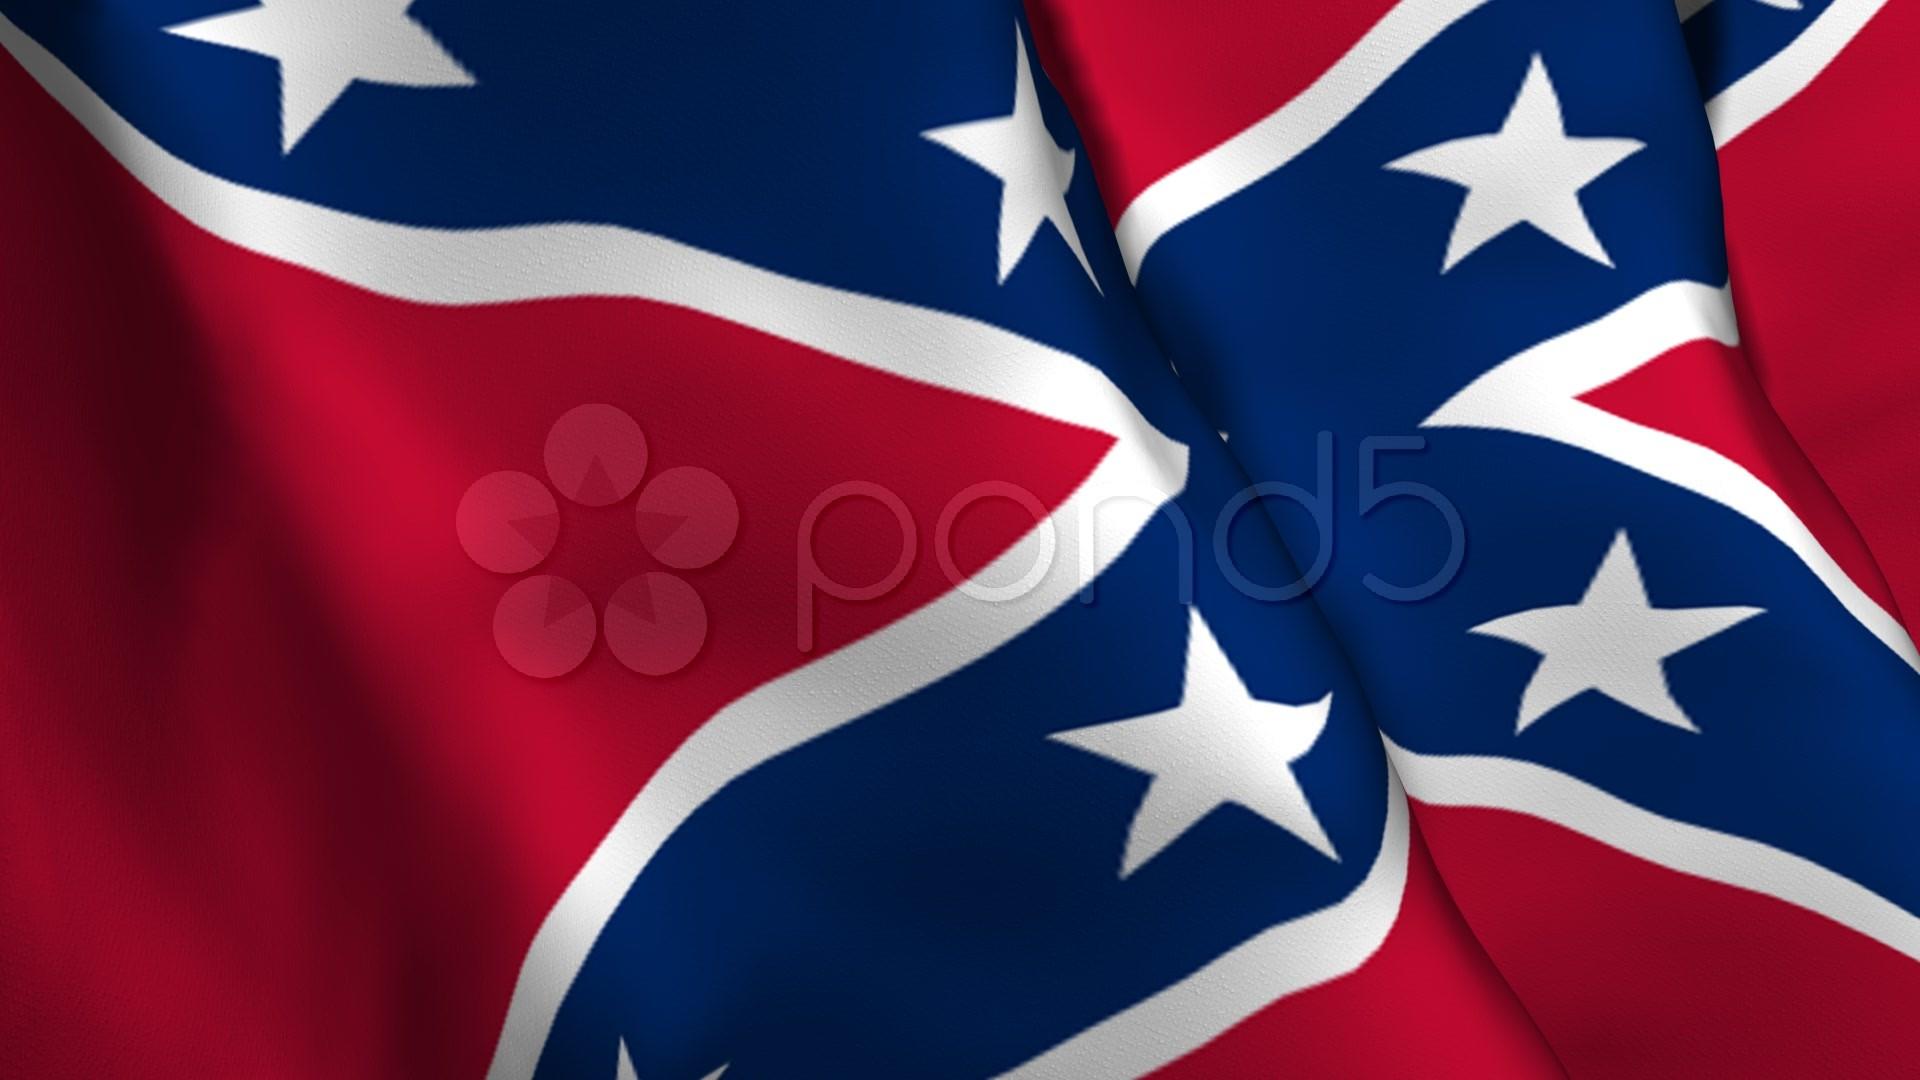 Rebal Flag Wallpaper Posted By Sarah Simpson